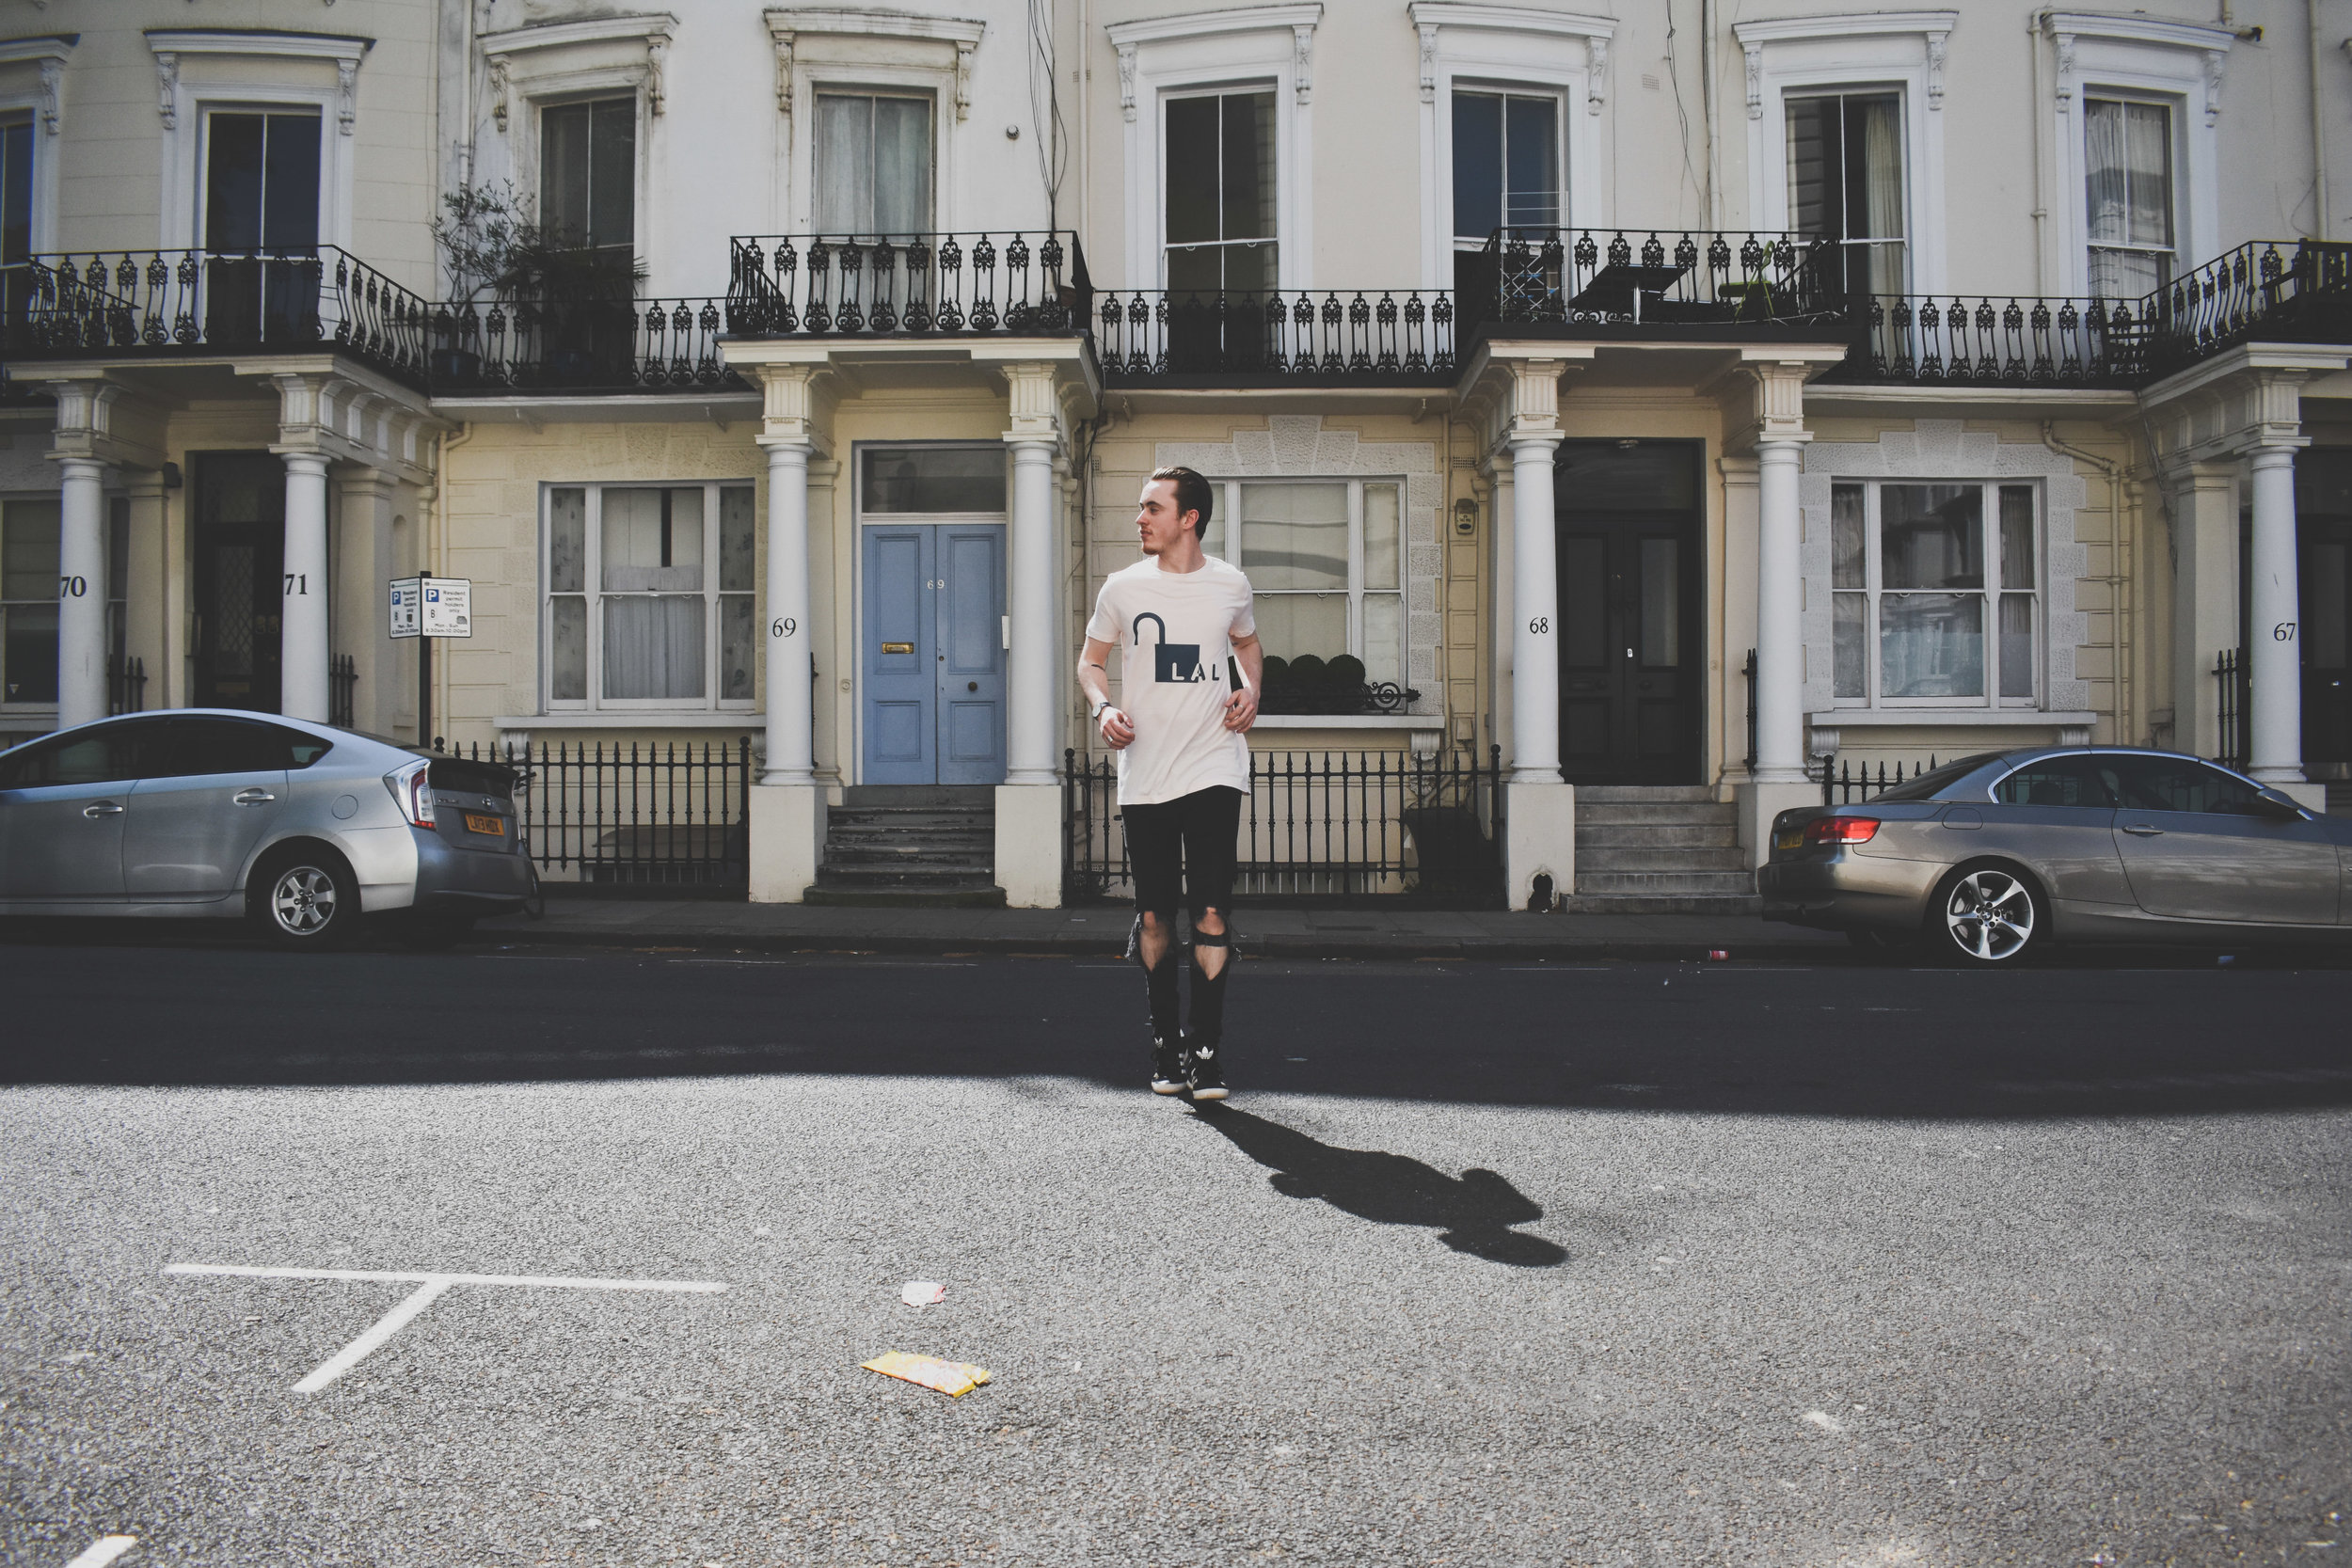 Jack Clarke, Notting Hill, London